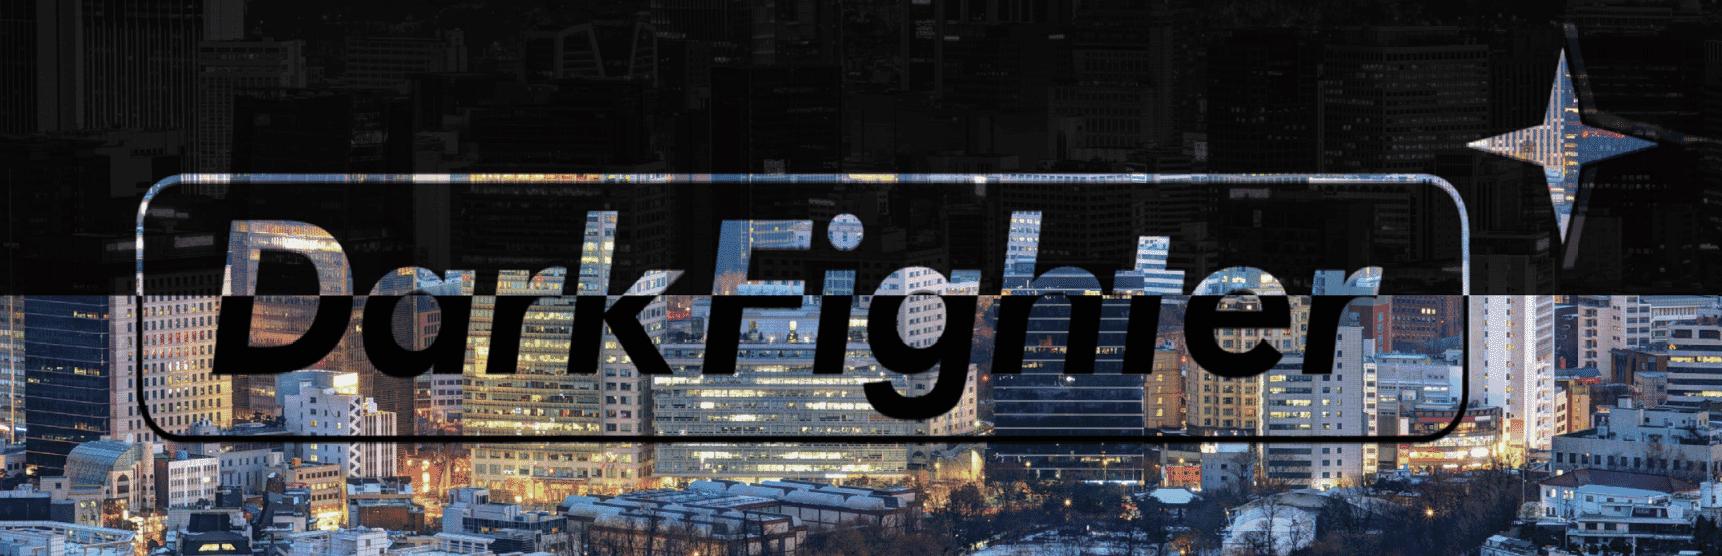 Darkfighter_Tech.png